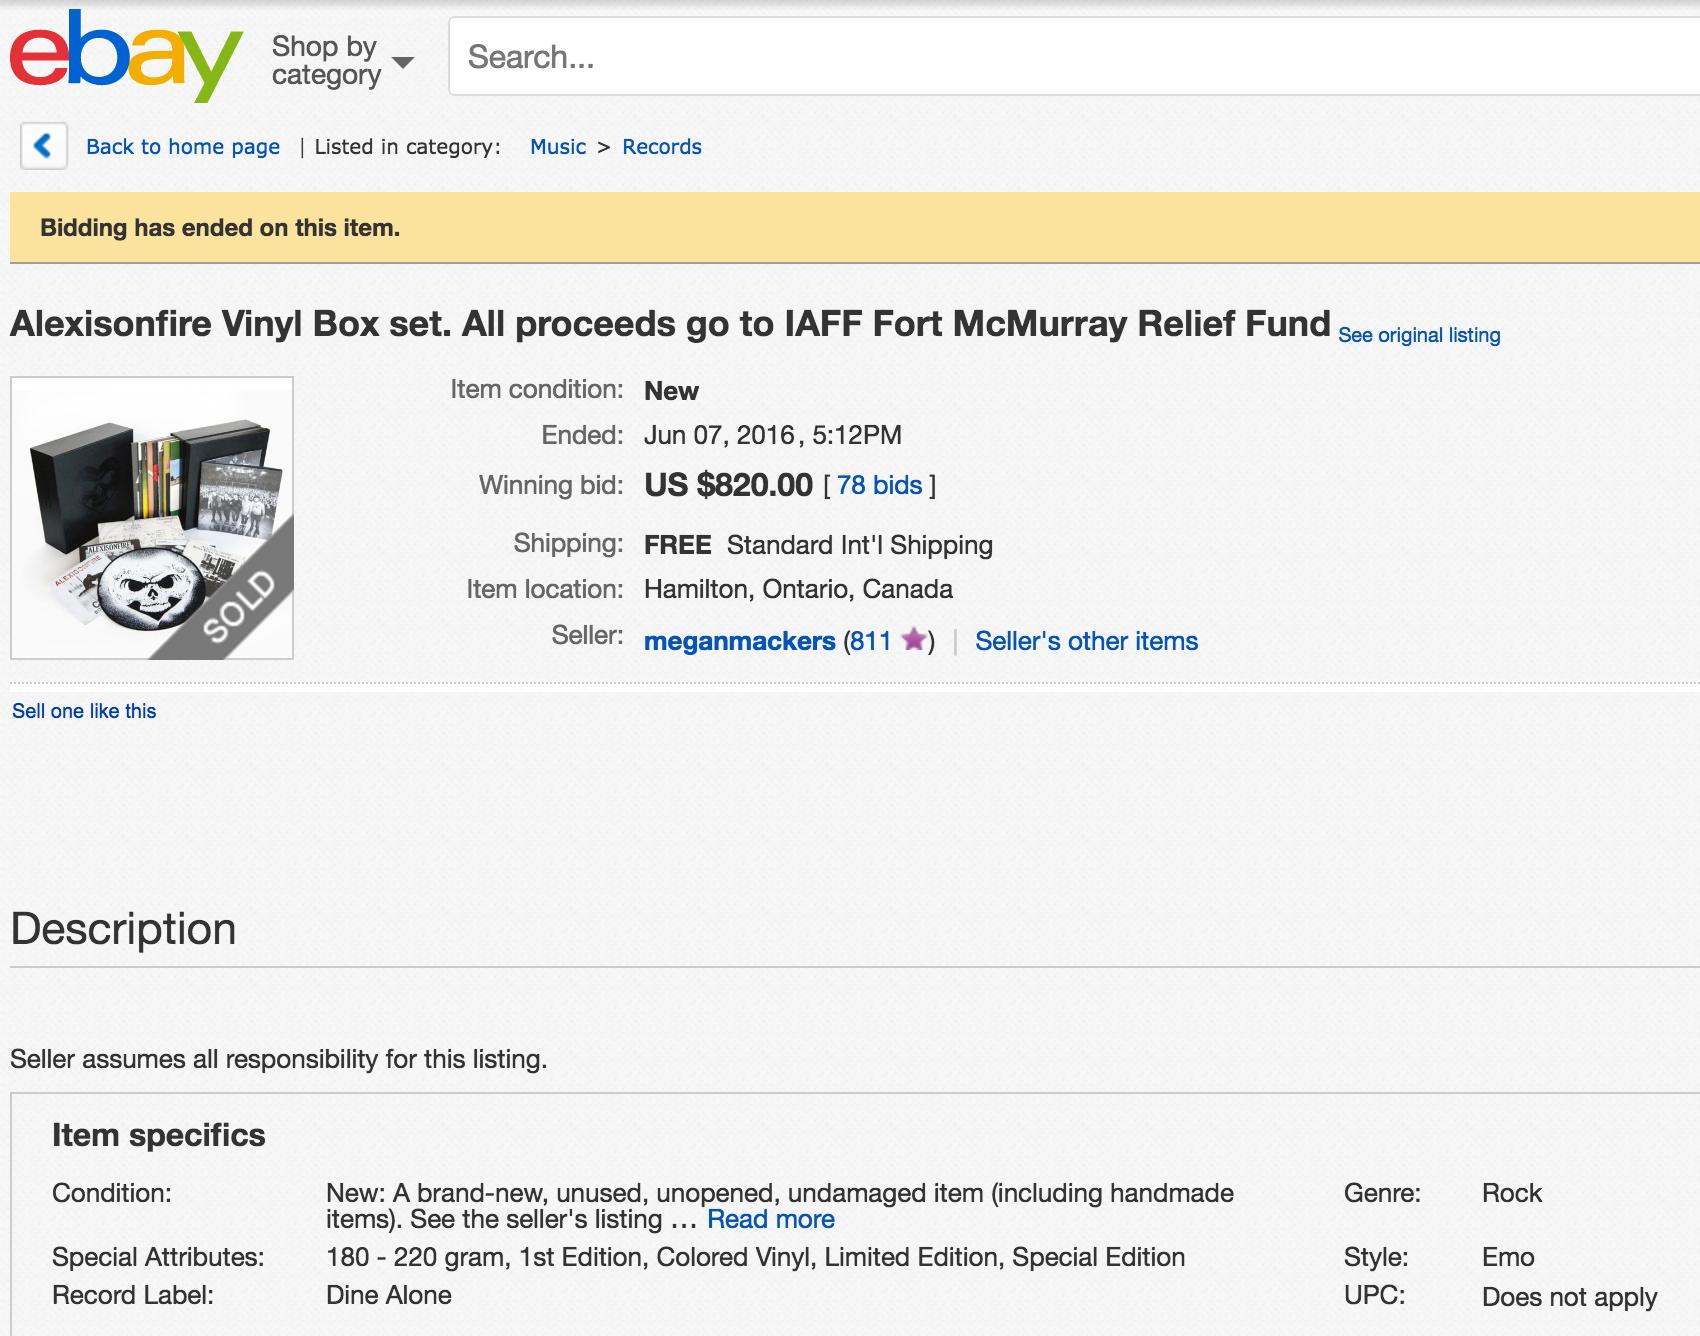 alexisonfire-vinil-box-ebay